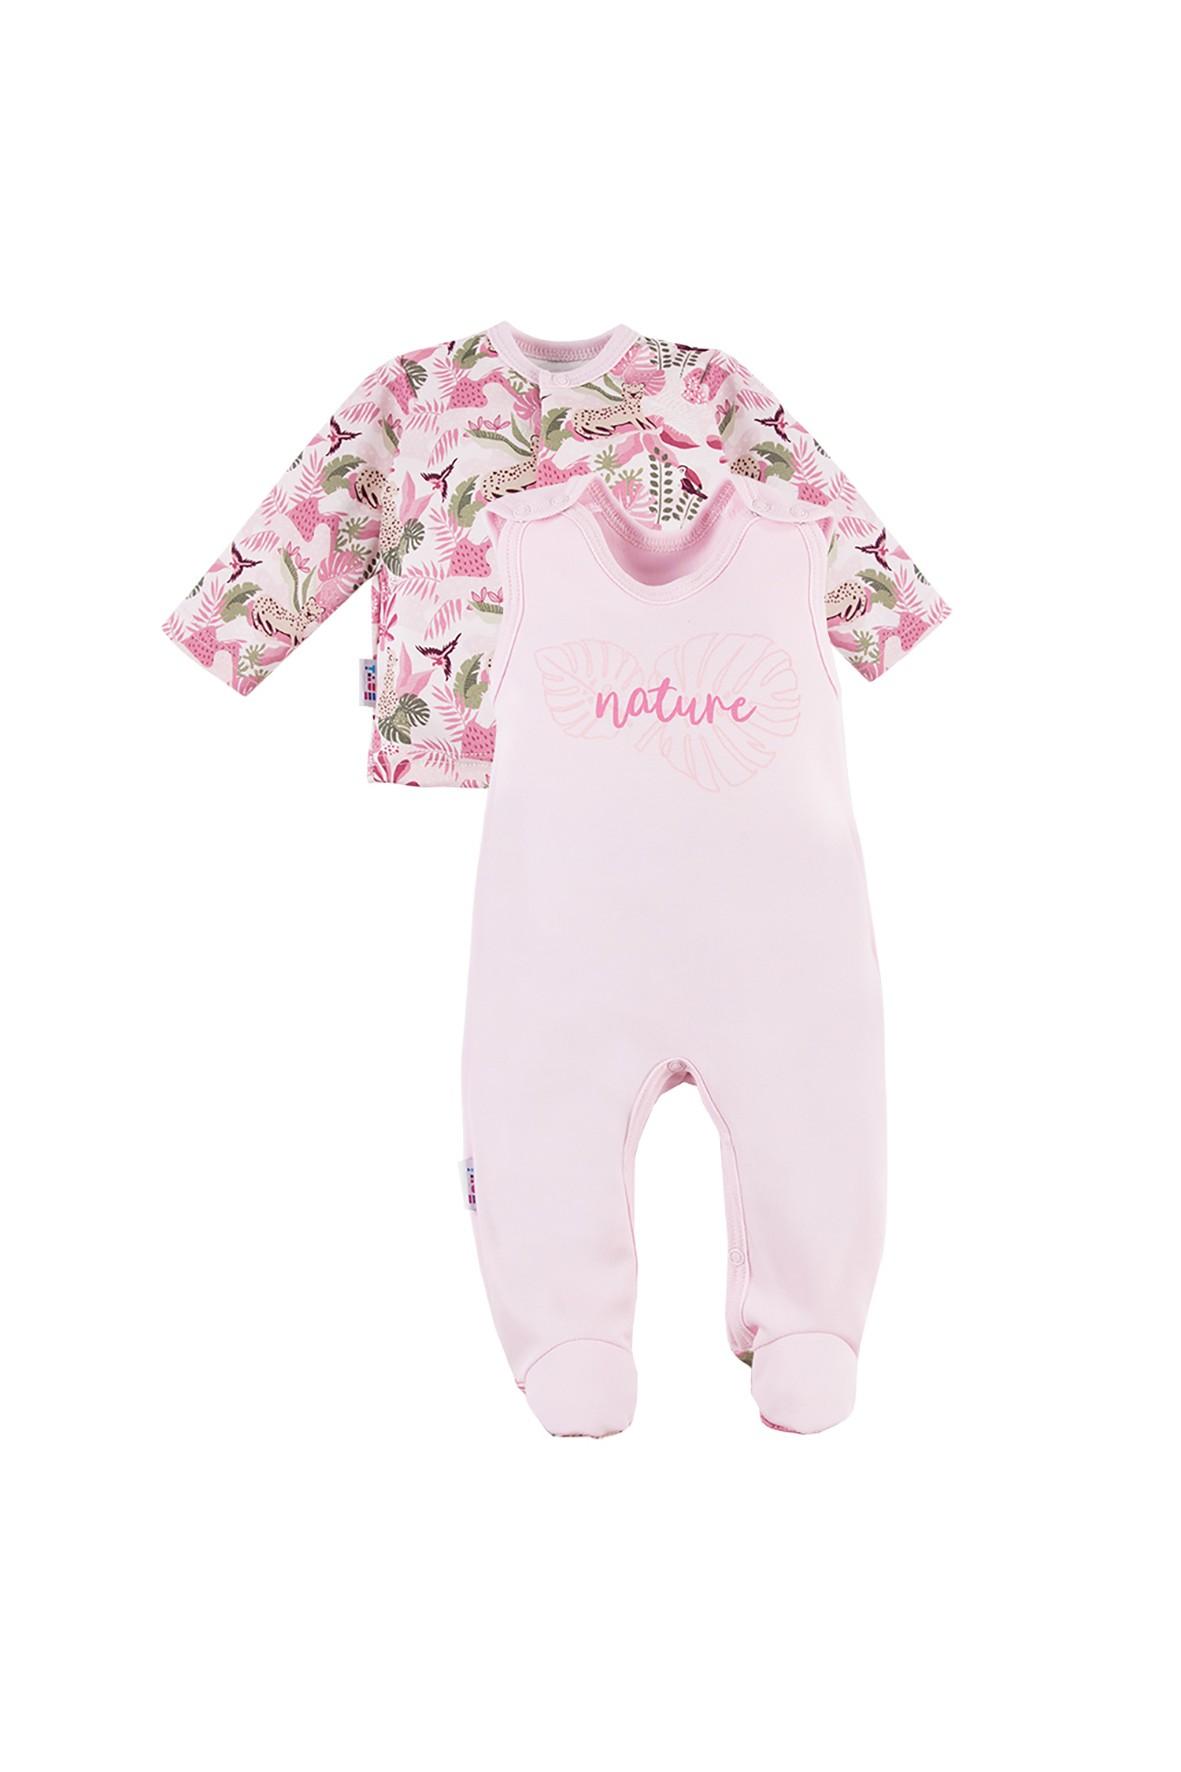 Komplet niemowlęcy NATURE różowy